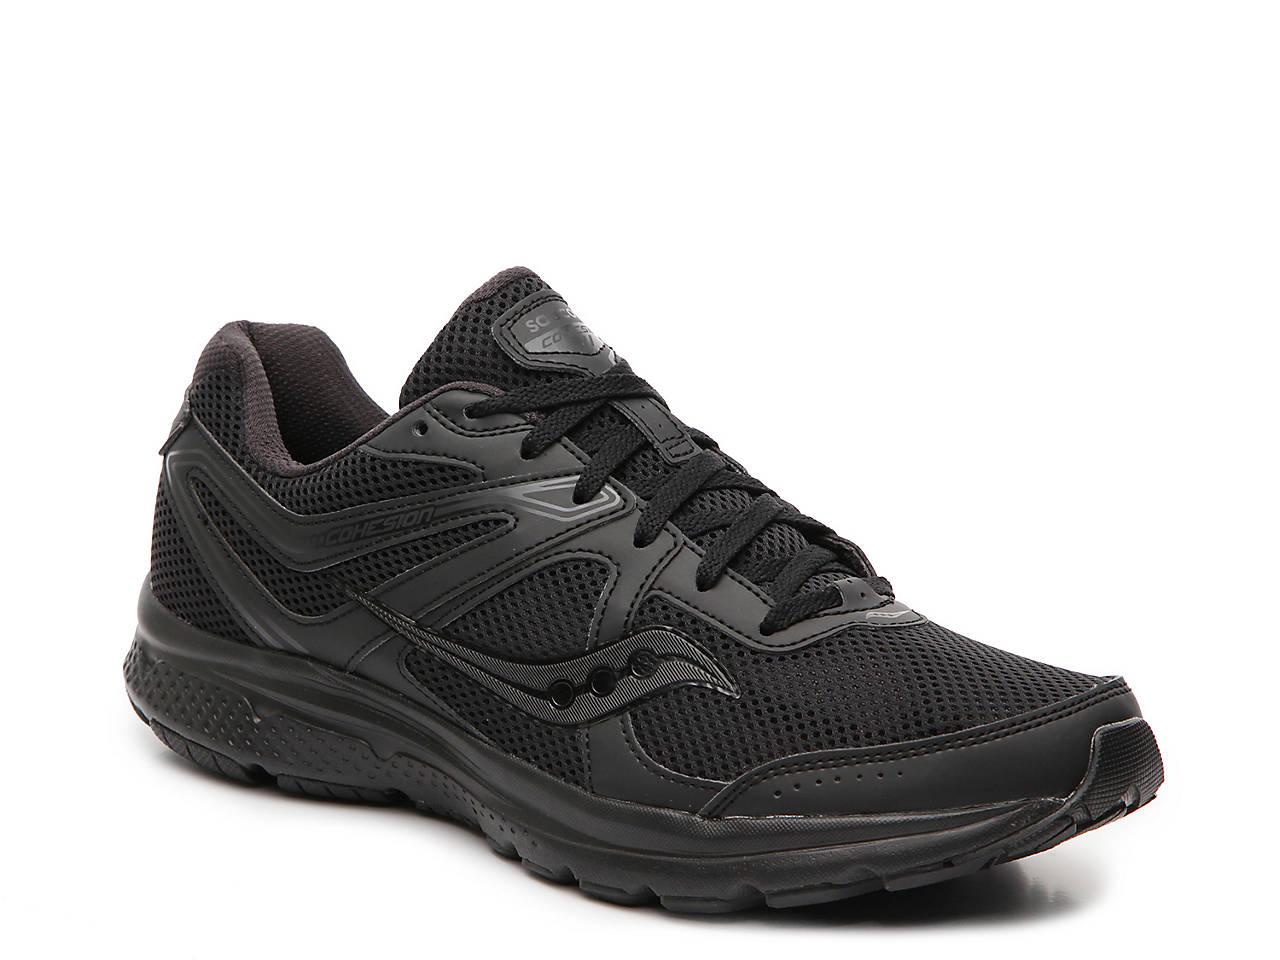 aae76d61 Grid Cohesion 11 Running Shoe - Men's